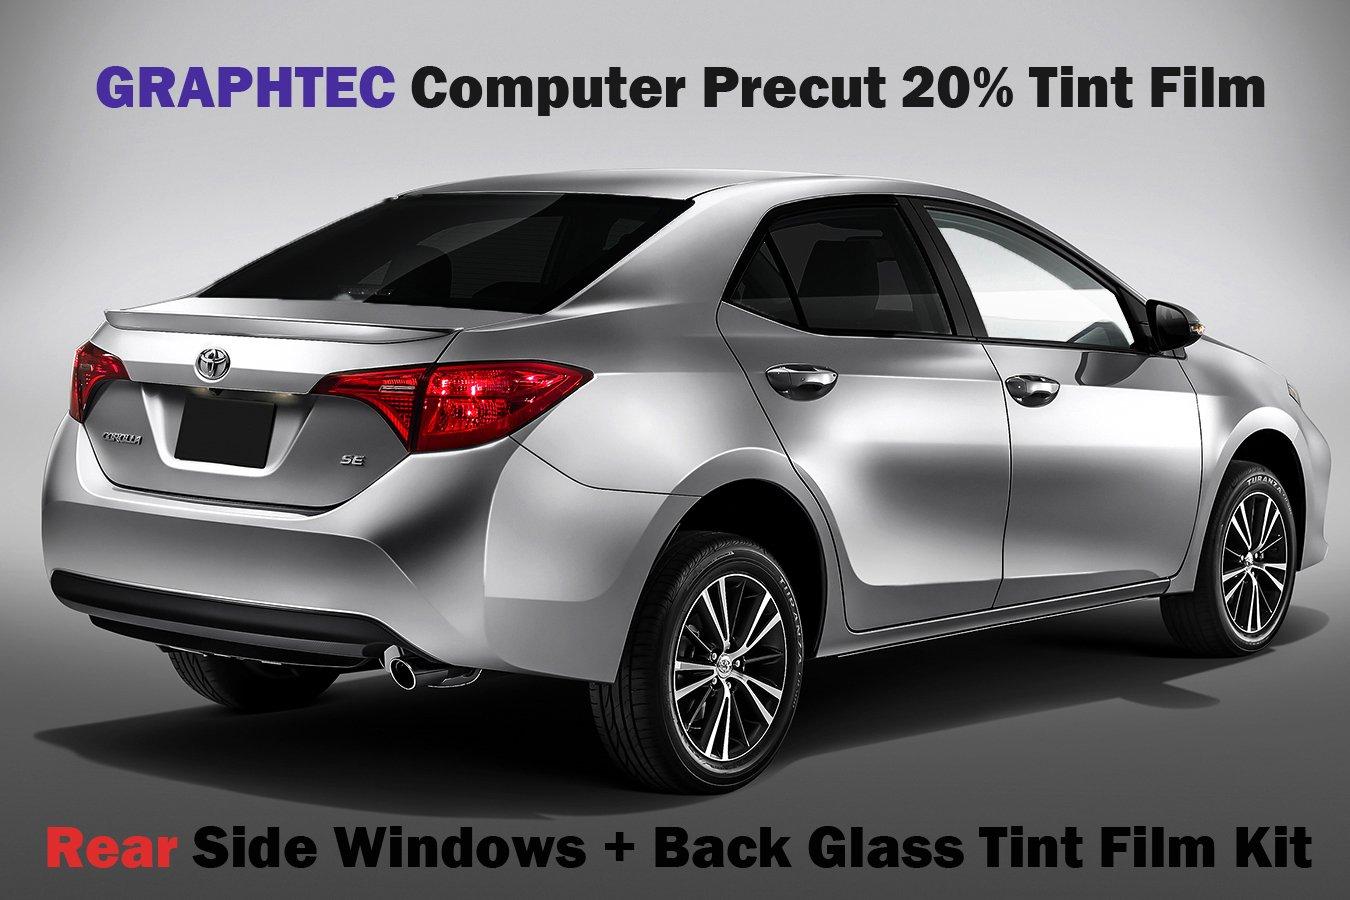 Amazon 14 16 Toyota Corolla 20 VLT Black Rear Side Window W Back Glass Tint Film Precut Kit Automotive